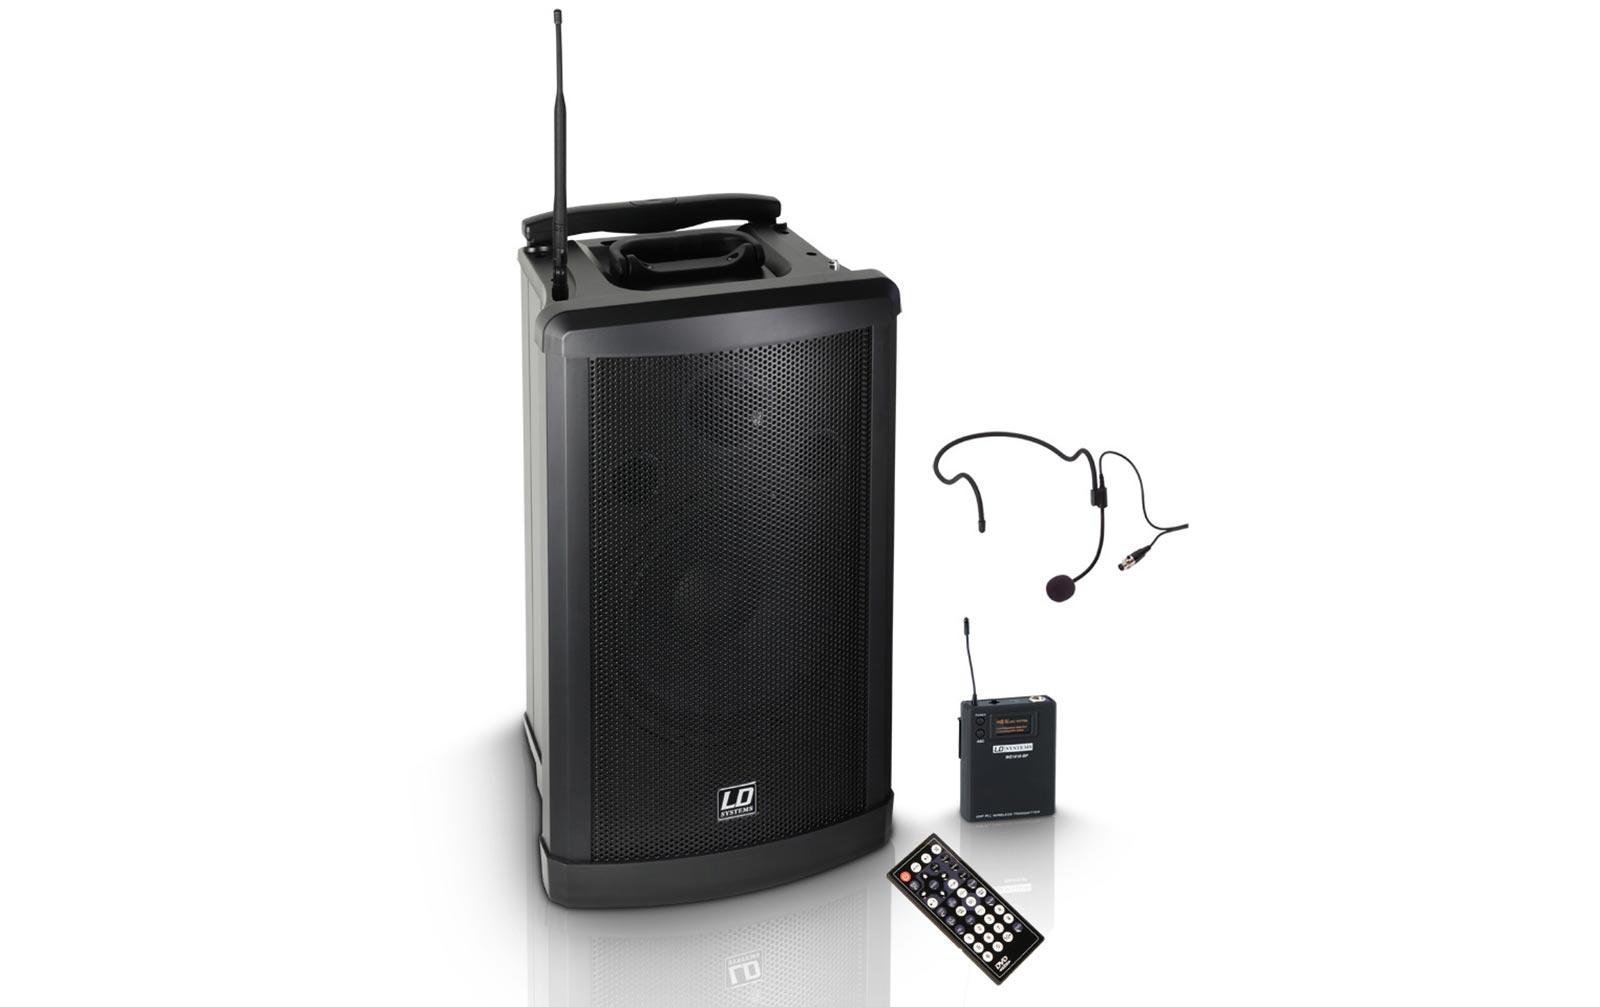 ld-systems-roadman-102-mobiler-pa-lautsprecher-mit-headset